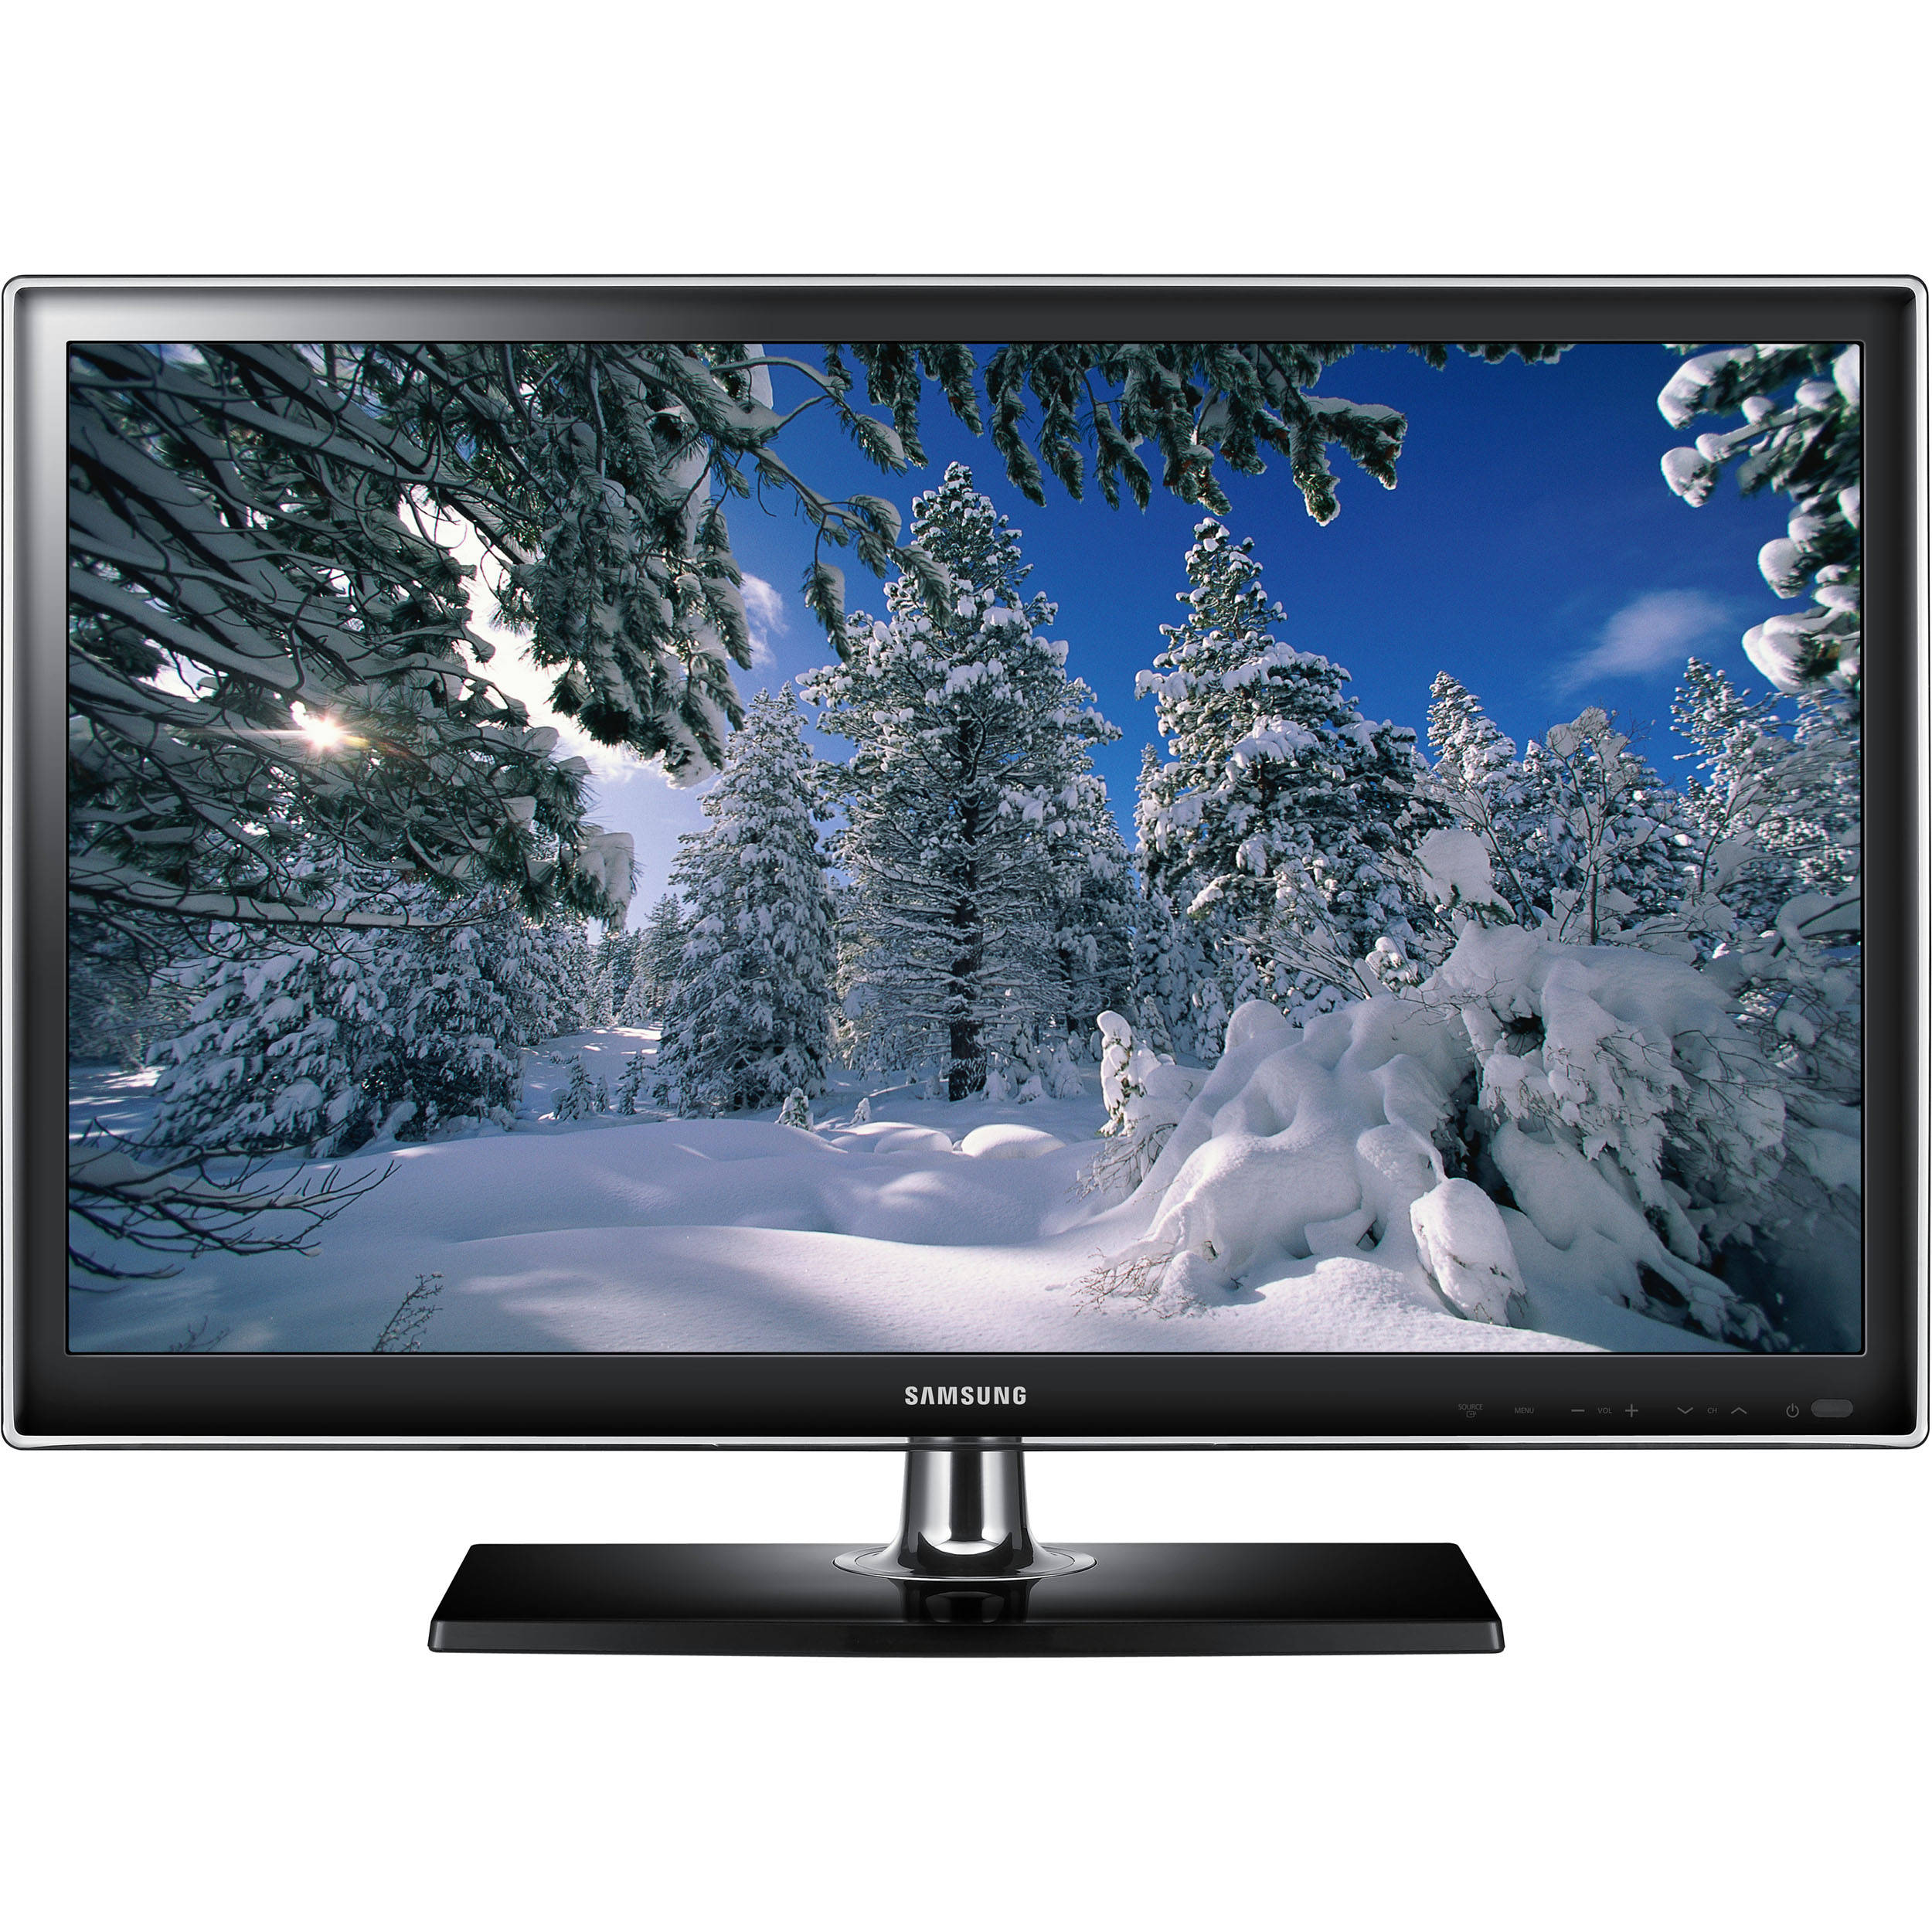 Samsung Ua32d5000 32 Series 5 Multi System Led Ua 32d5000